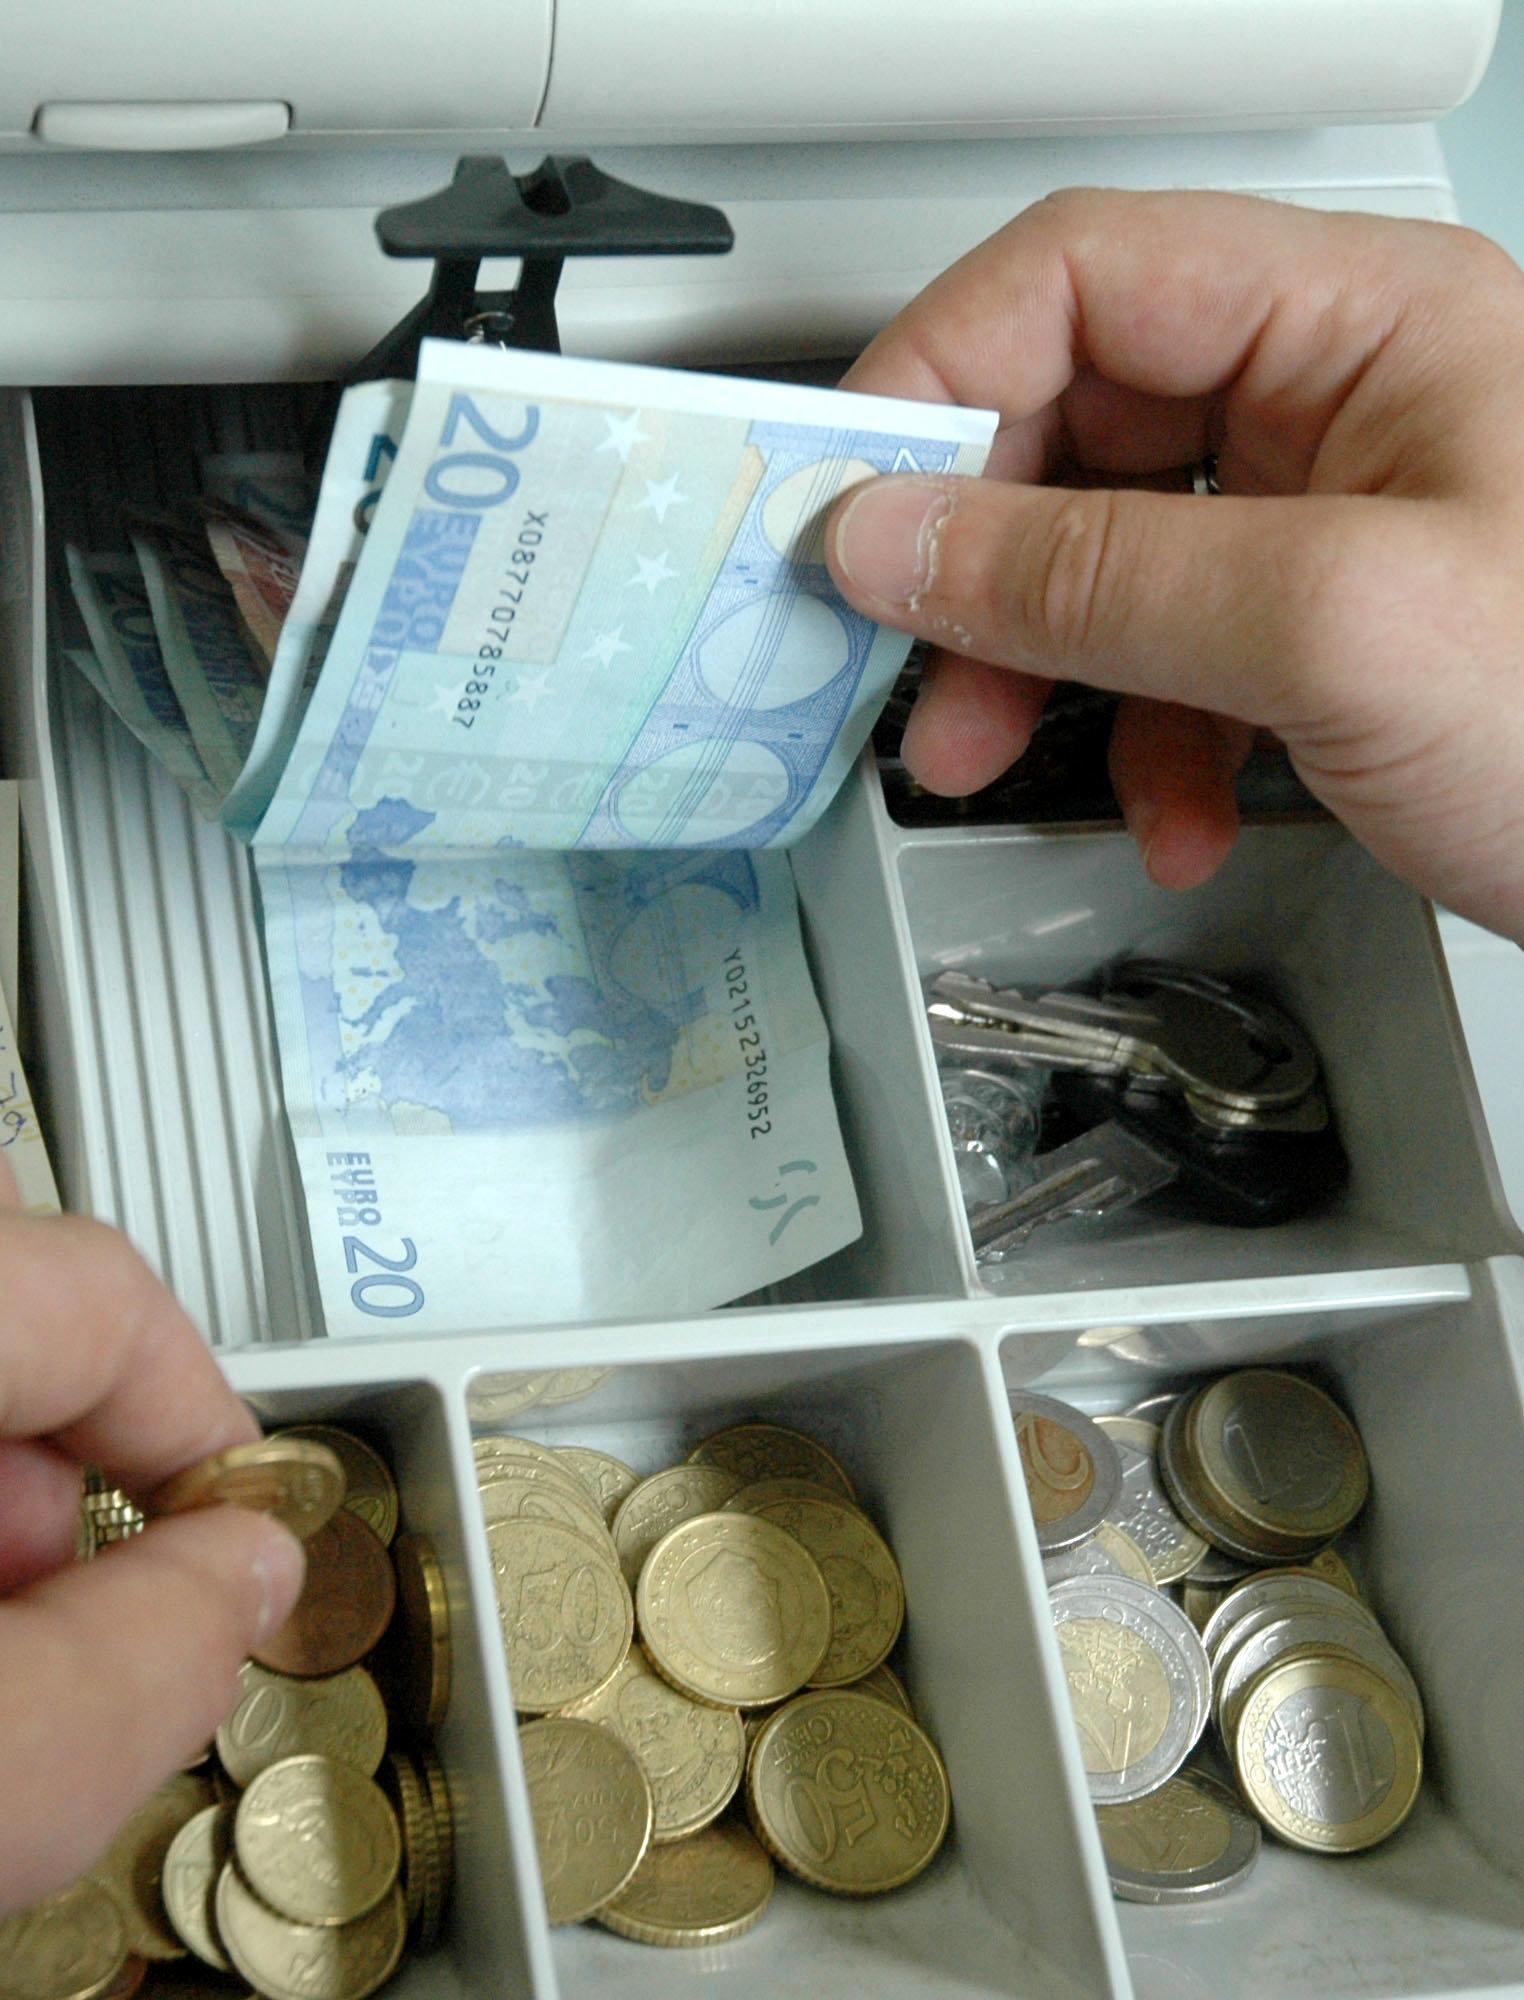 Le Monde: «Στην Ελλάδα η μάχη κατά της φοροδιαφυγής δίνει τους πρώτους